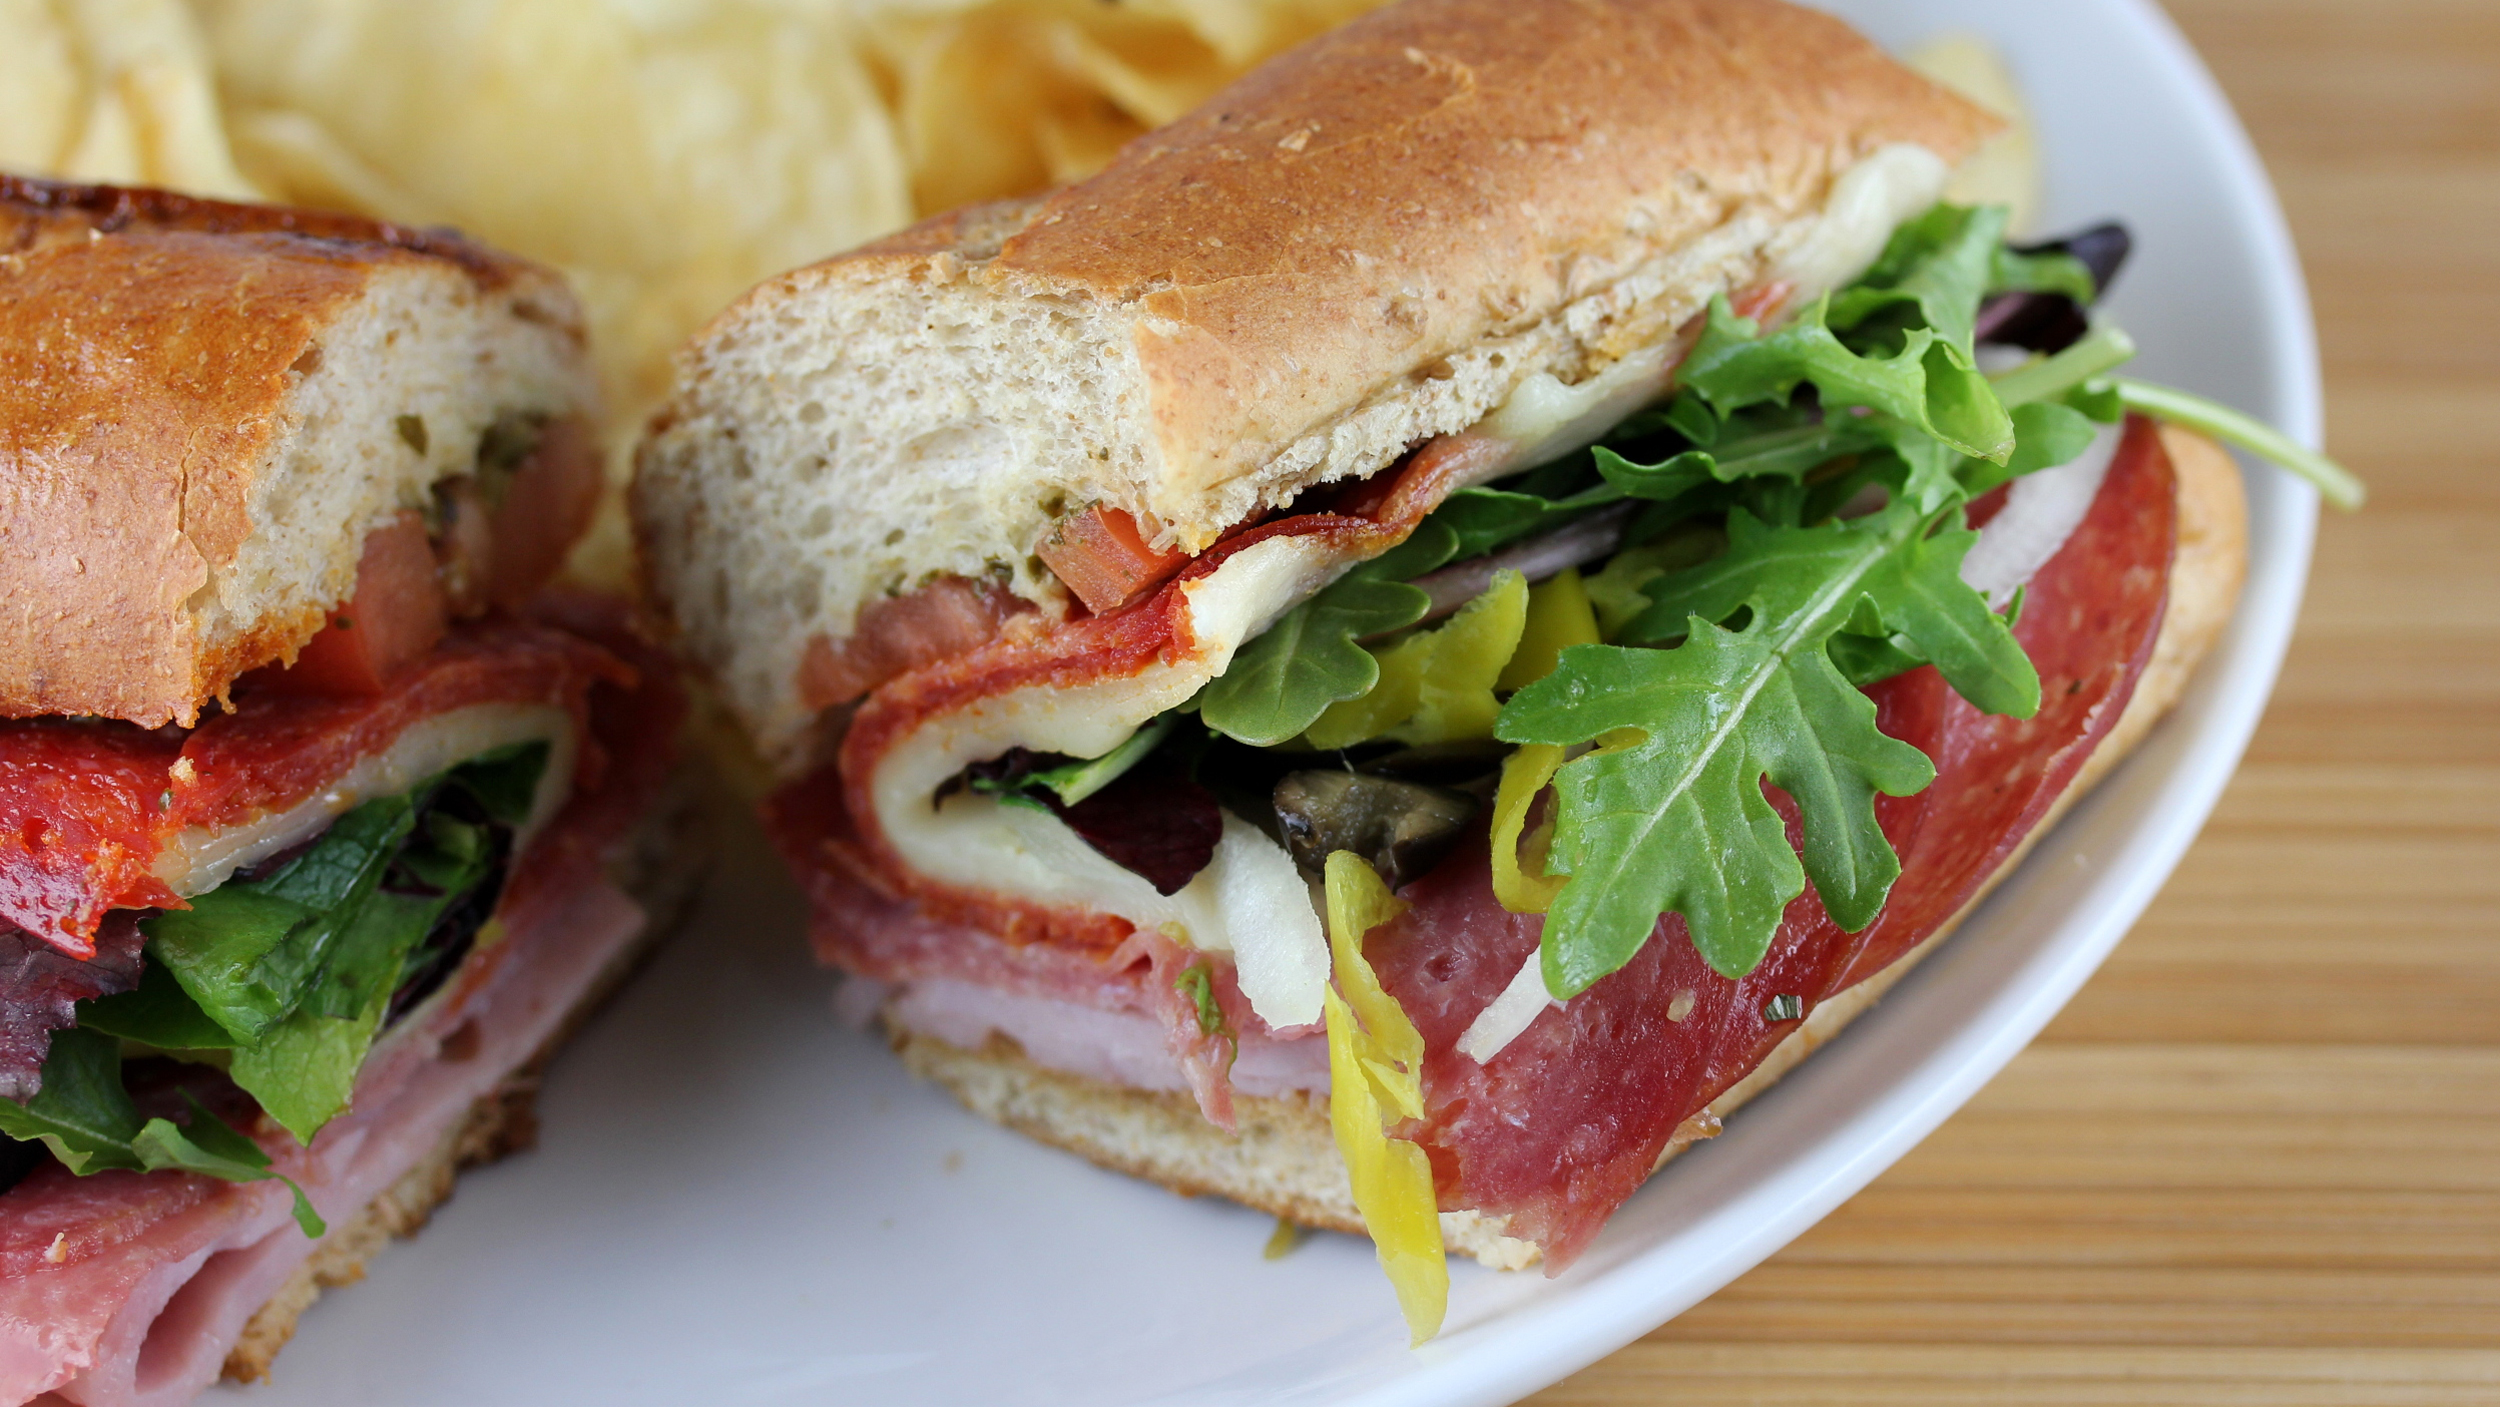 The Best Sub Sandwich Recipes A Classic Italian Sub A